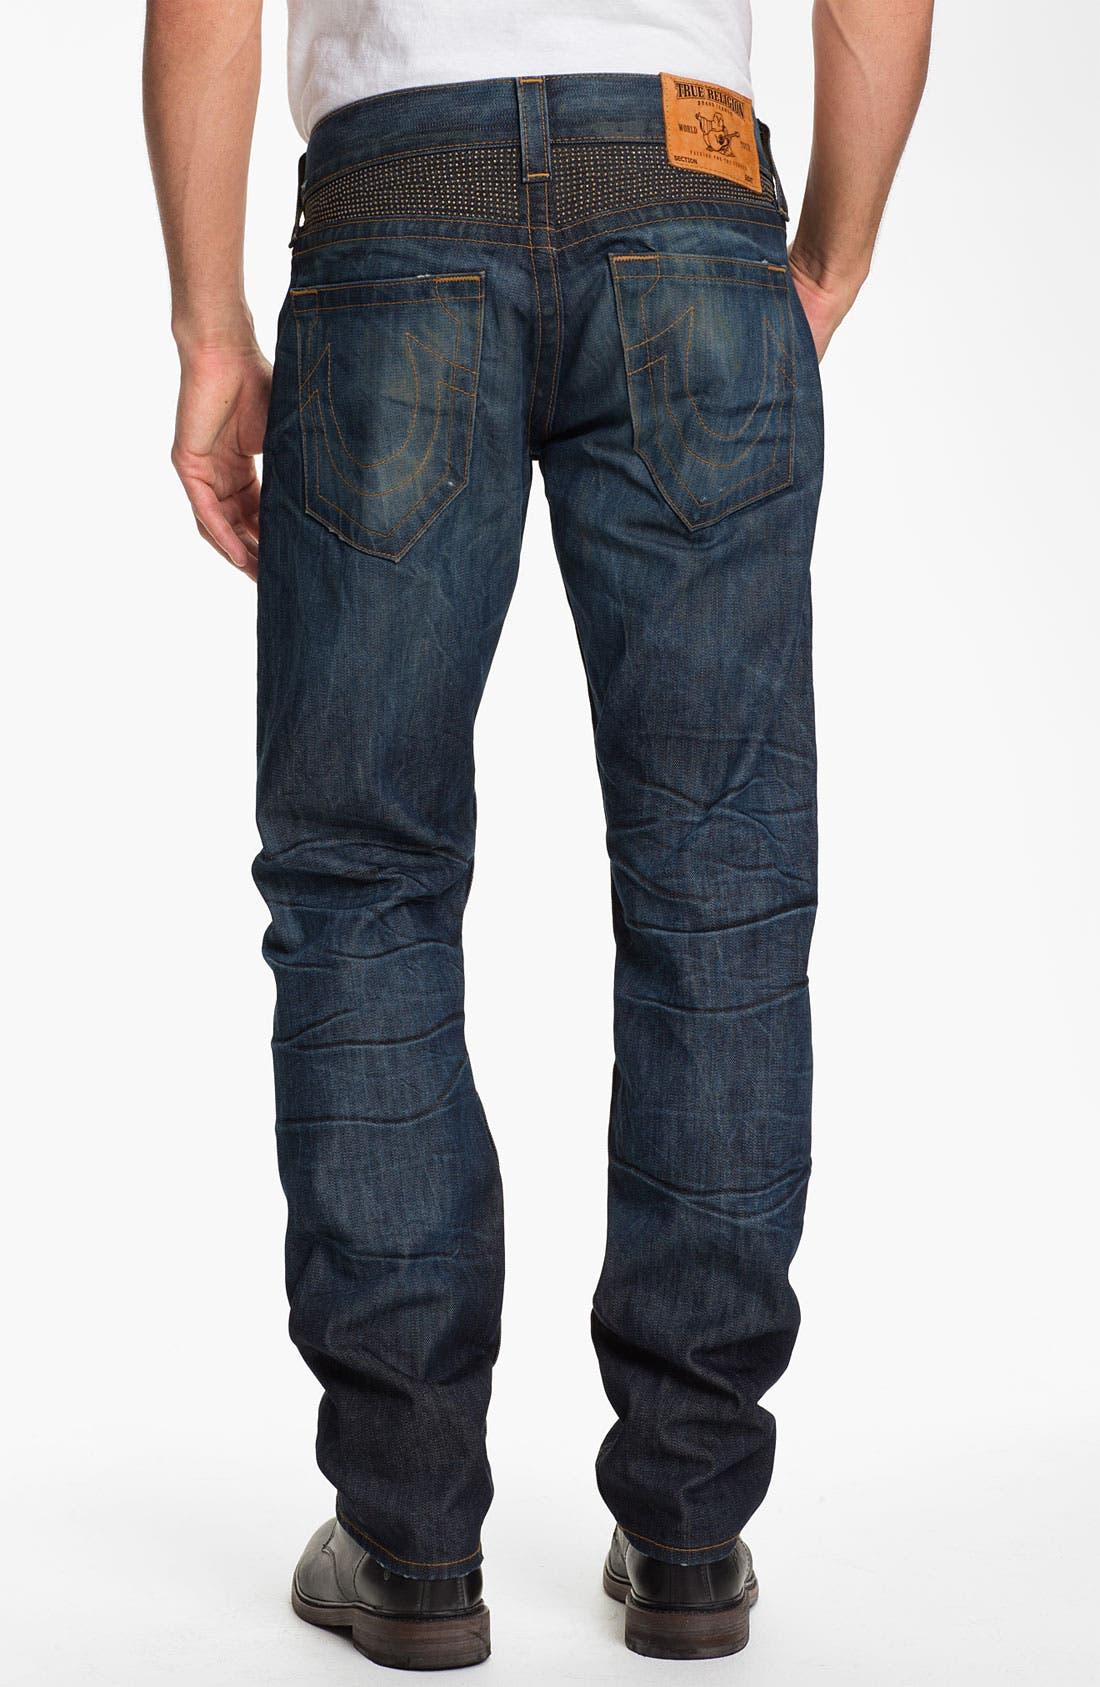 Main Image - True Religion Brand Jeans 'Geno' Slim Straight Leg Jeans (Hideout)